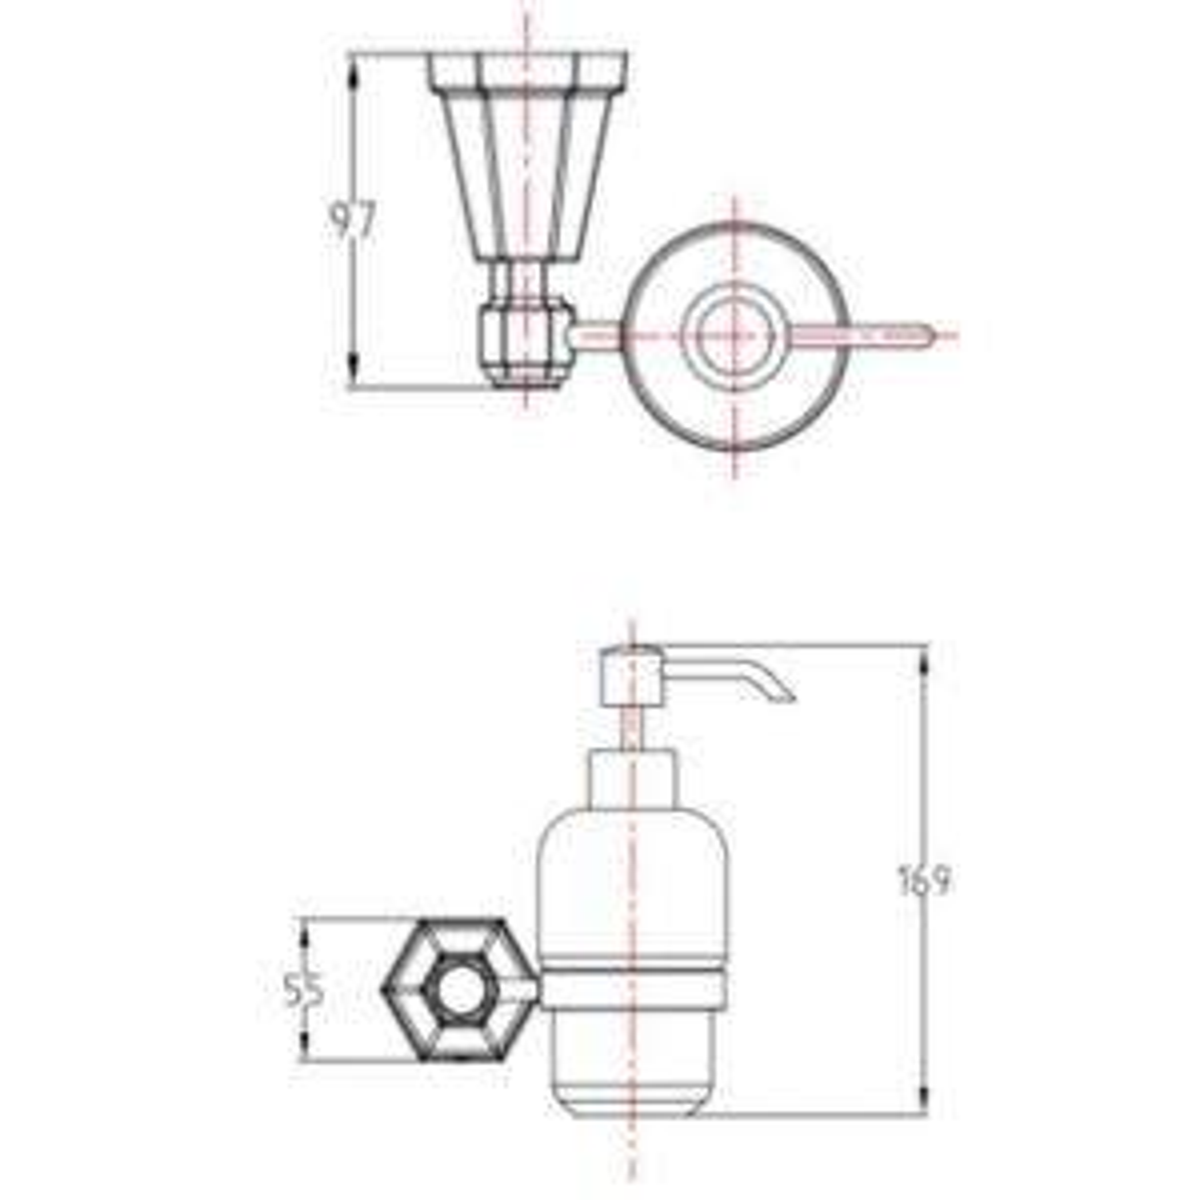 RAK Washington Ceramic Soap Dispenser Measurements